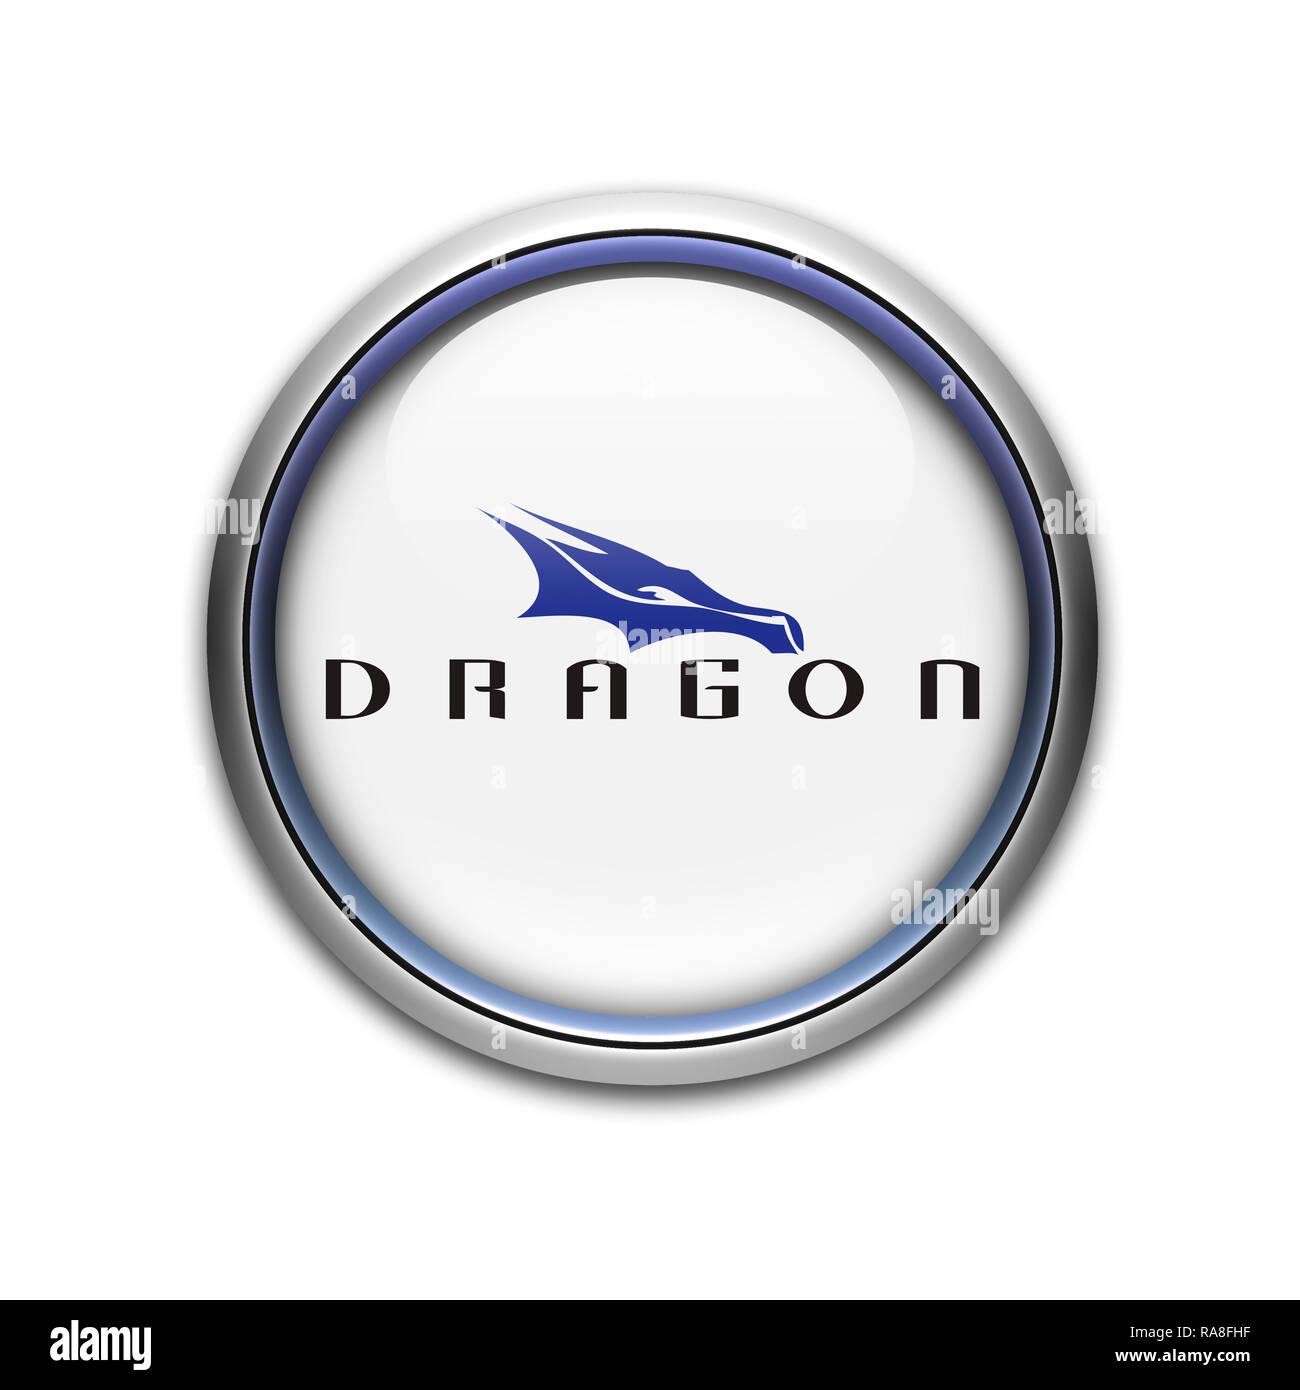 Dragon Spacex logo Stock Photo: 230069211 - Alamy